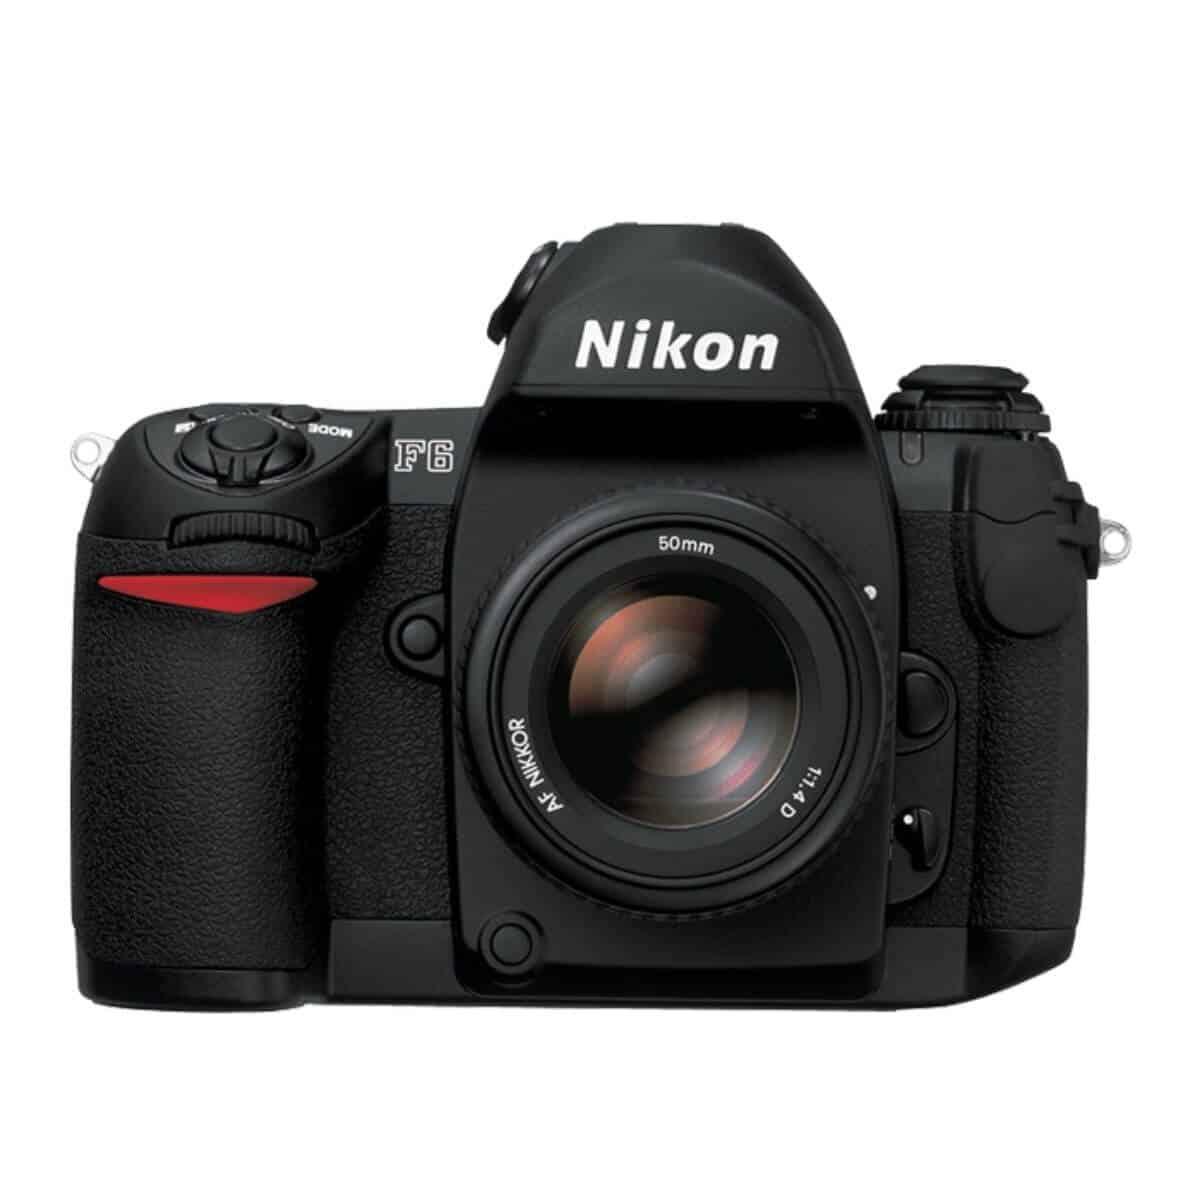 Nikon F6 camera.